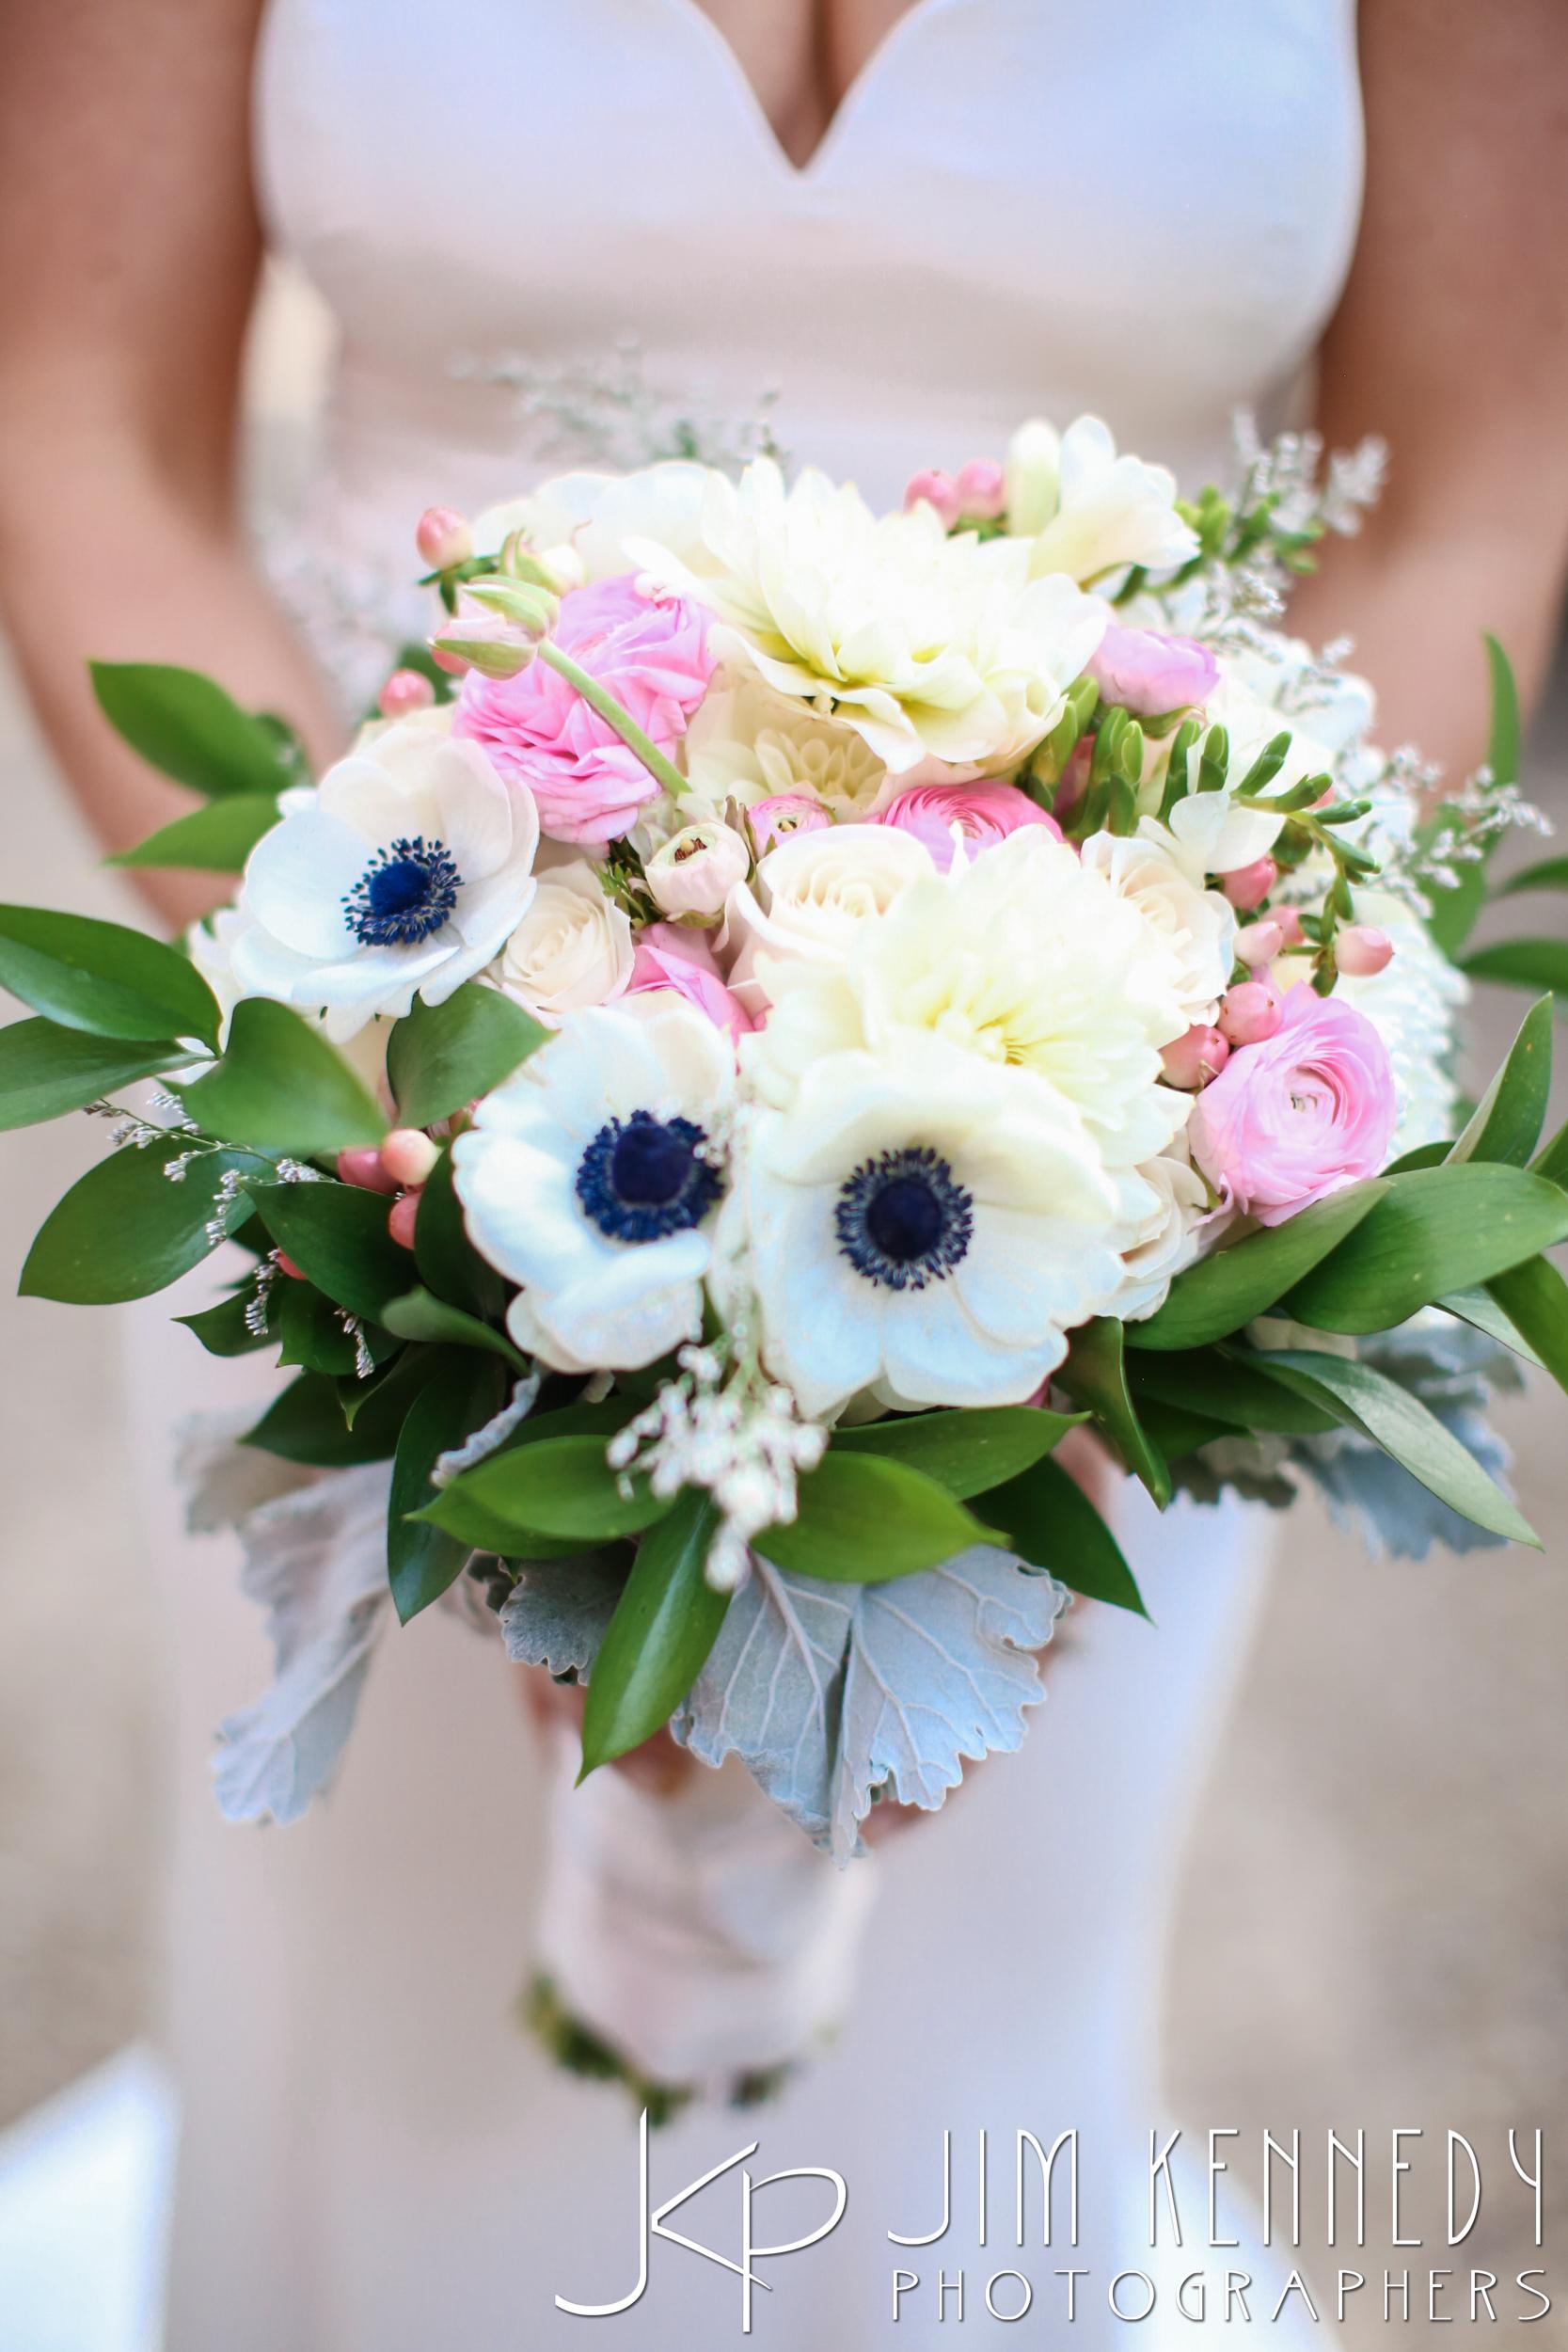 jim_kennedy_photographers_highland_springs_wedding_caitlyn_0051.jpg